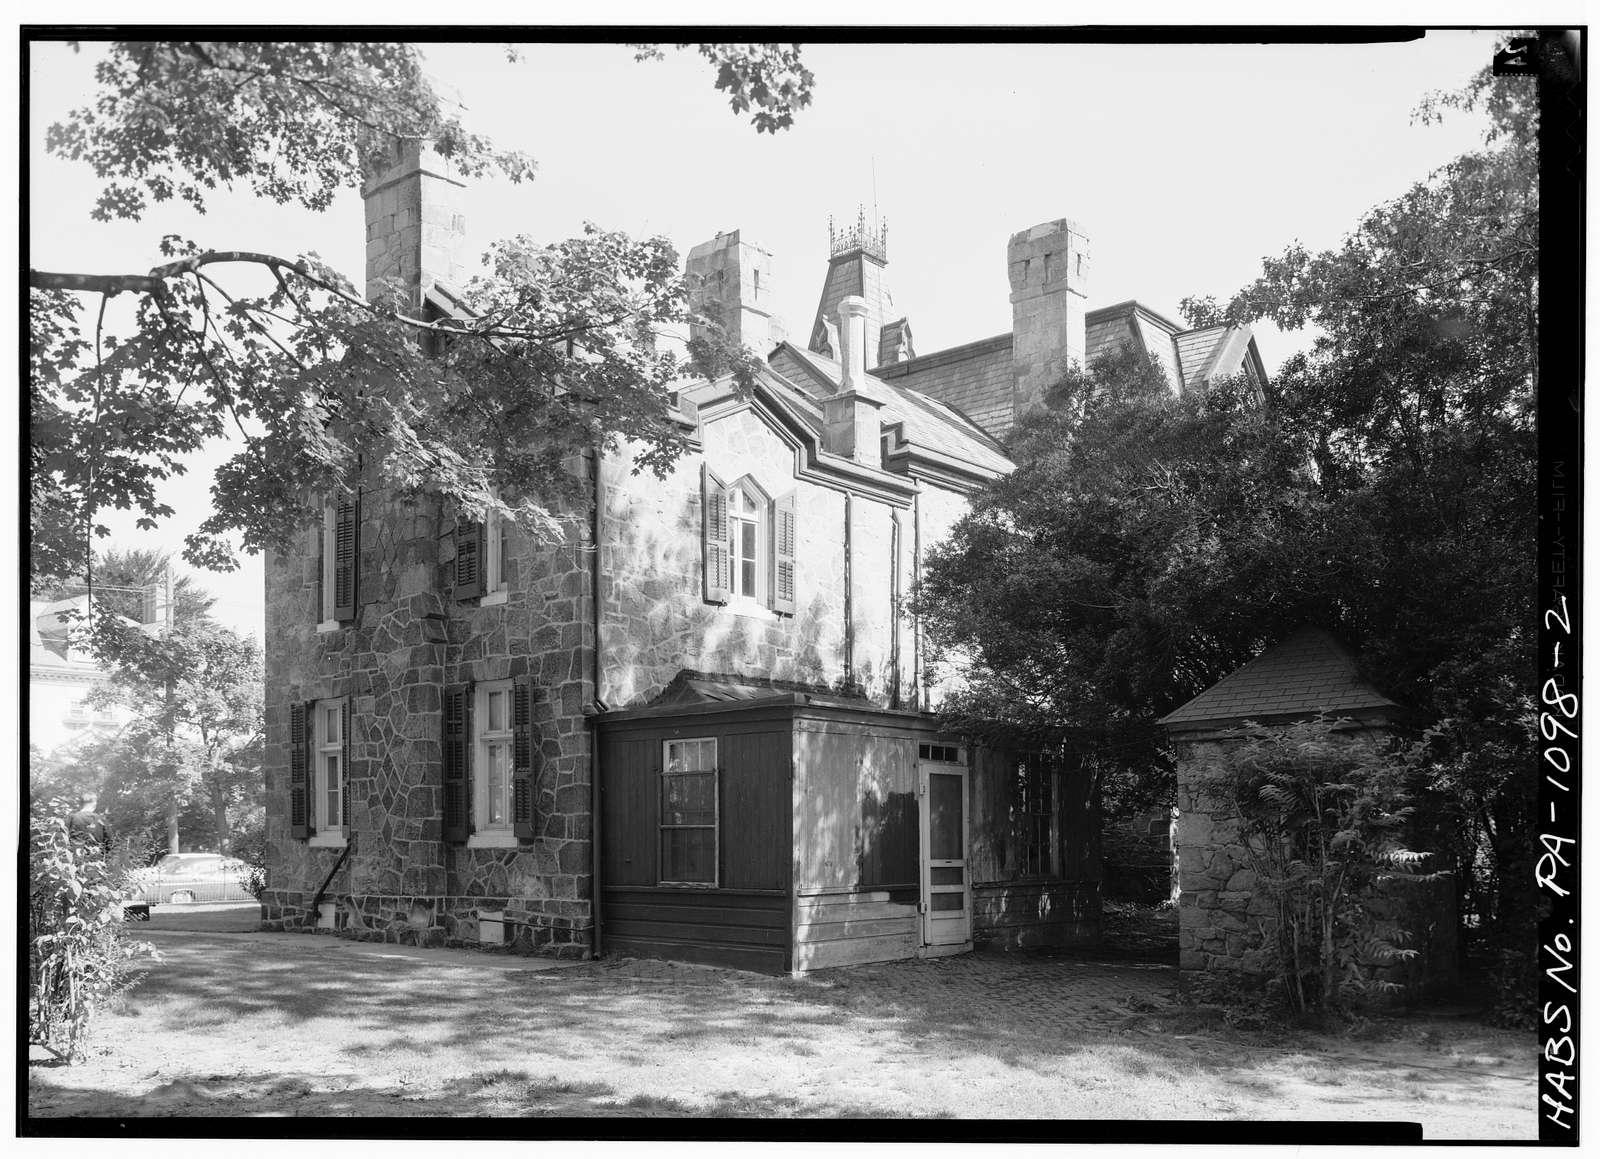 Ebenezer Maxwell House, 200 West Tulpehocken Street, Philadelphia, Philadelphia County, PA